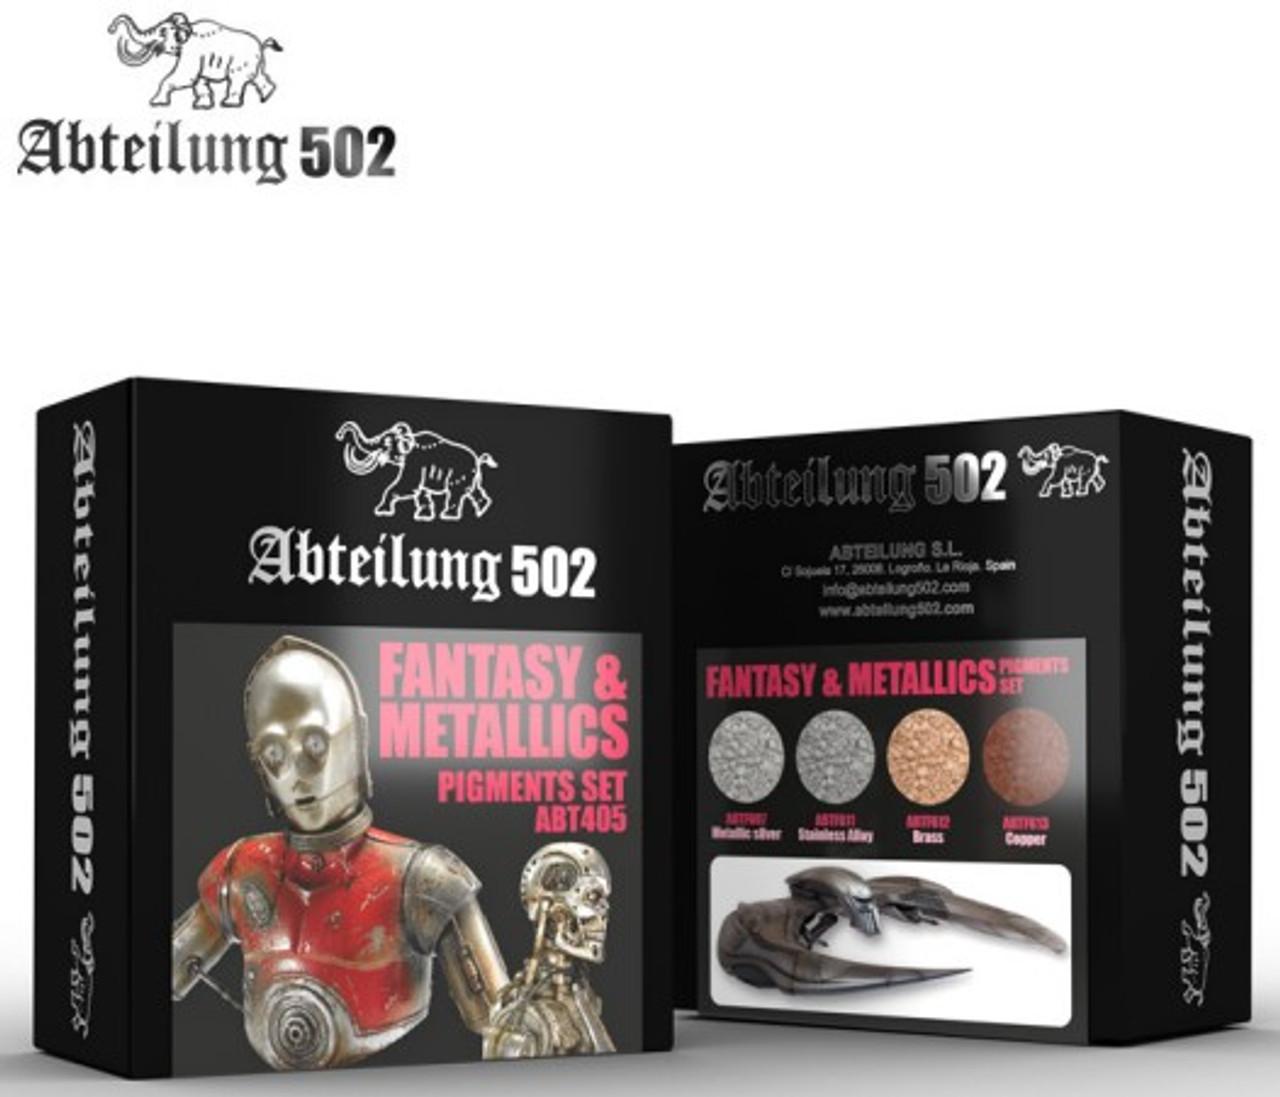 Fantasy & Metallics Pigment Set (4 Colors) 20ml Bottles